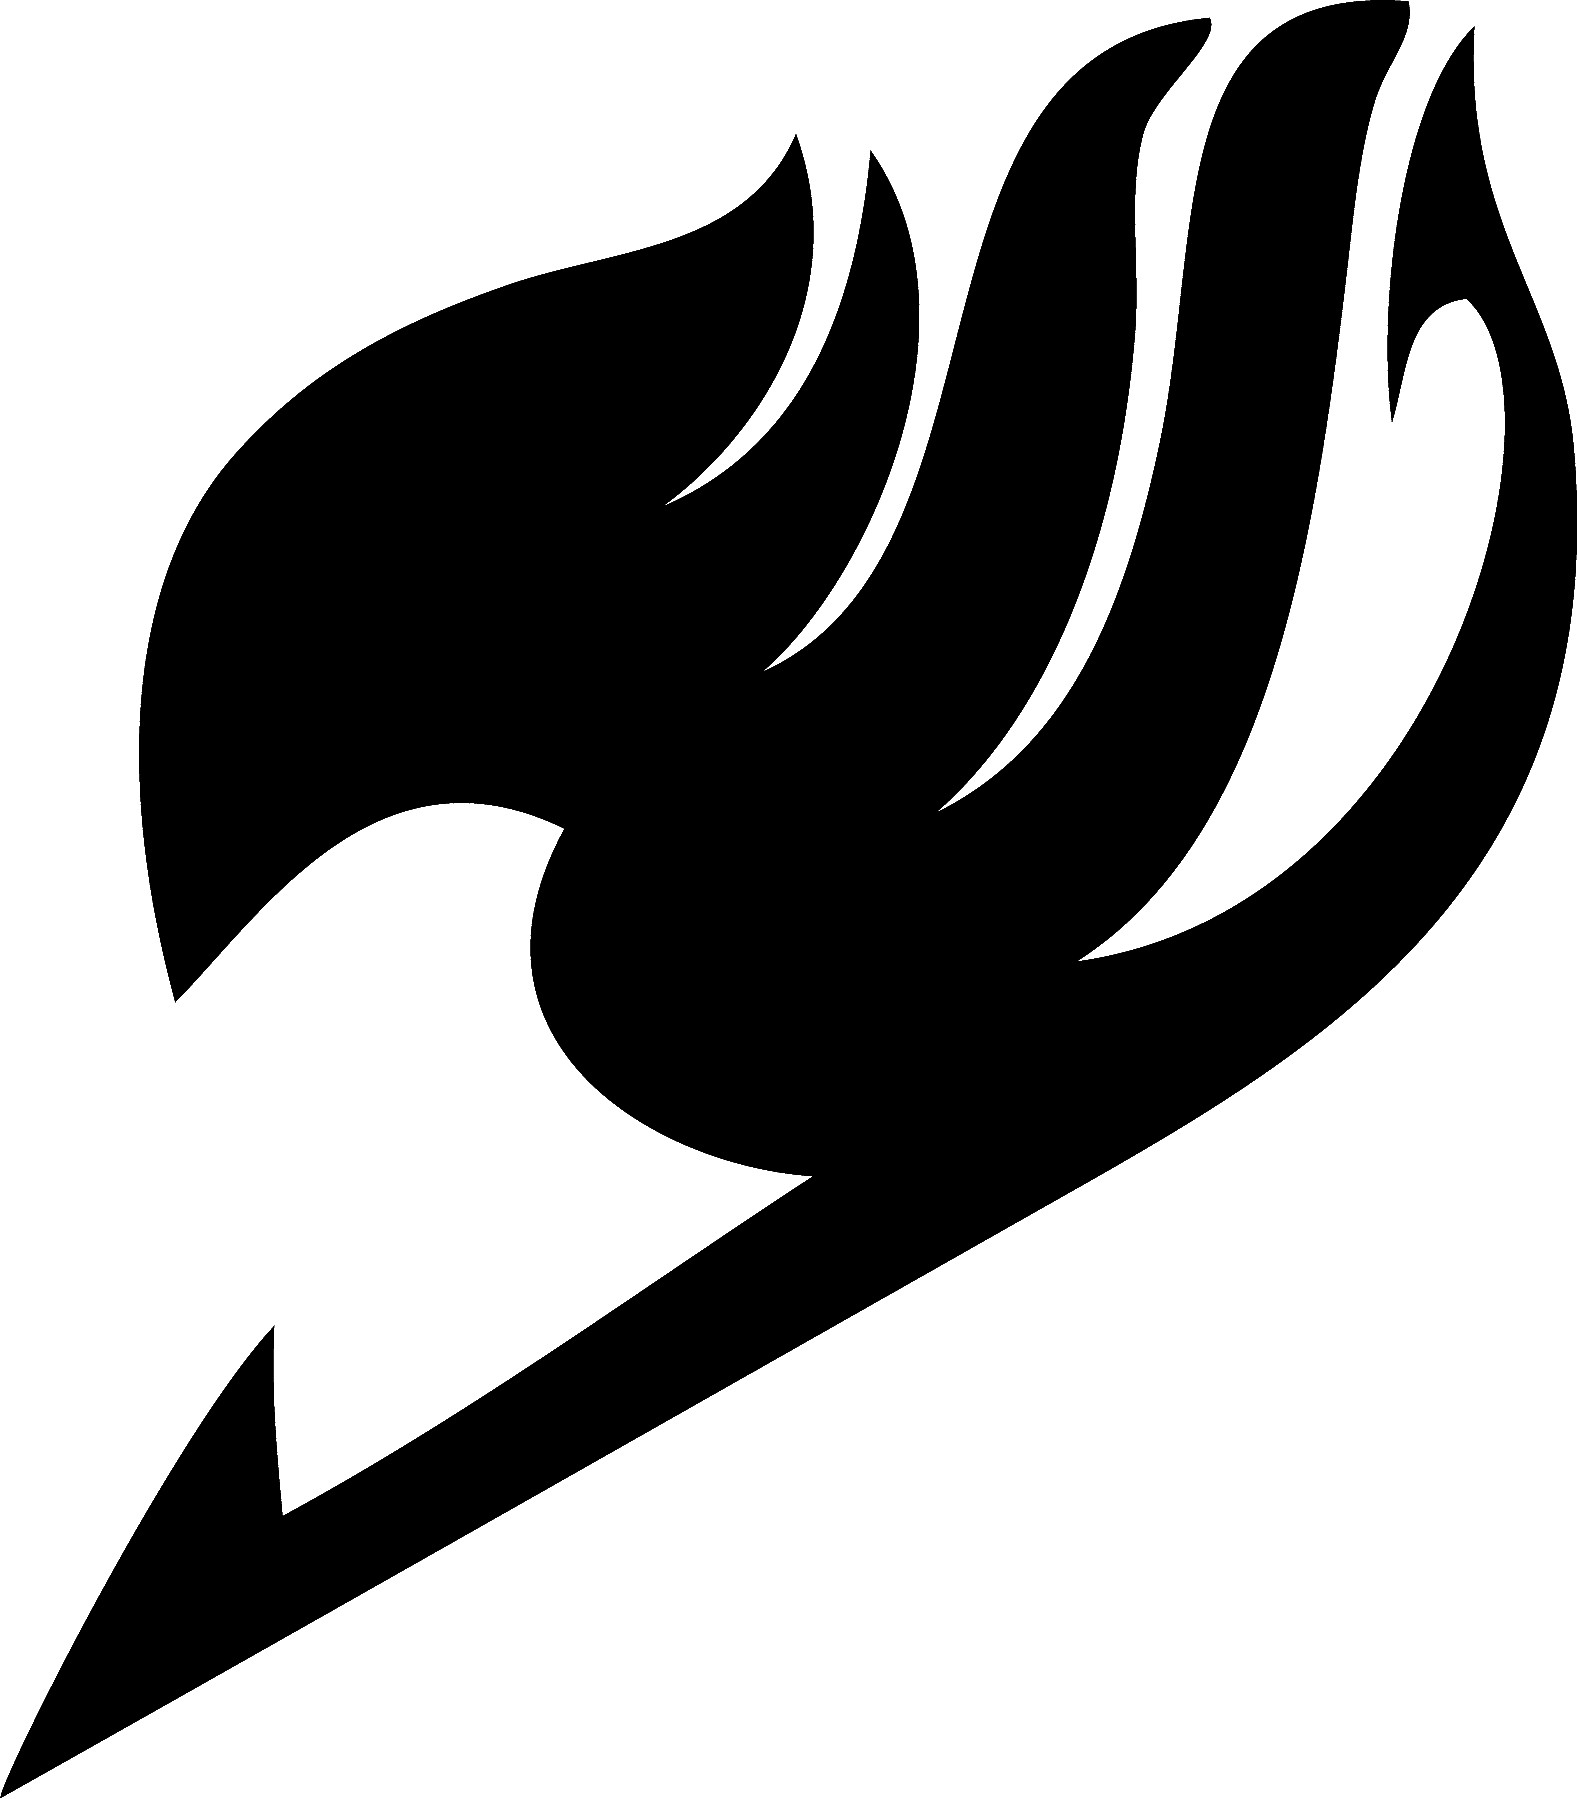 file:fairy tail logo - wikimedia commons